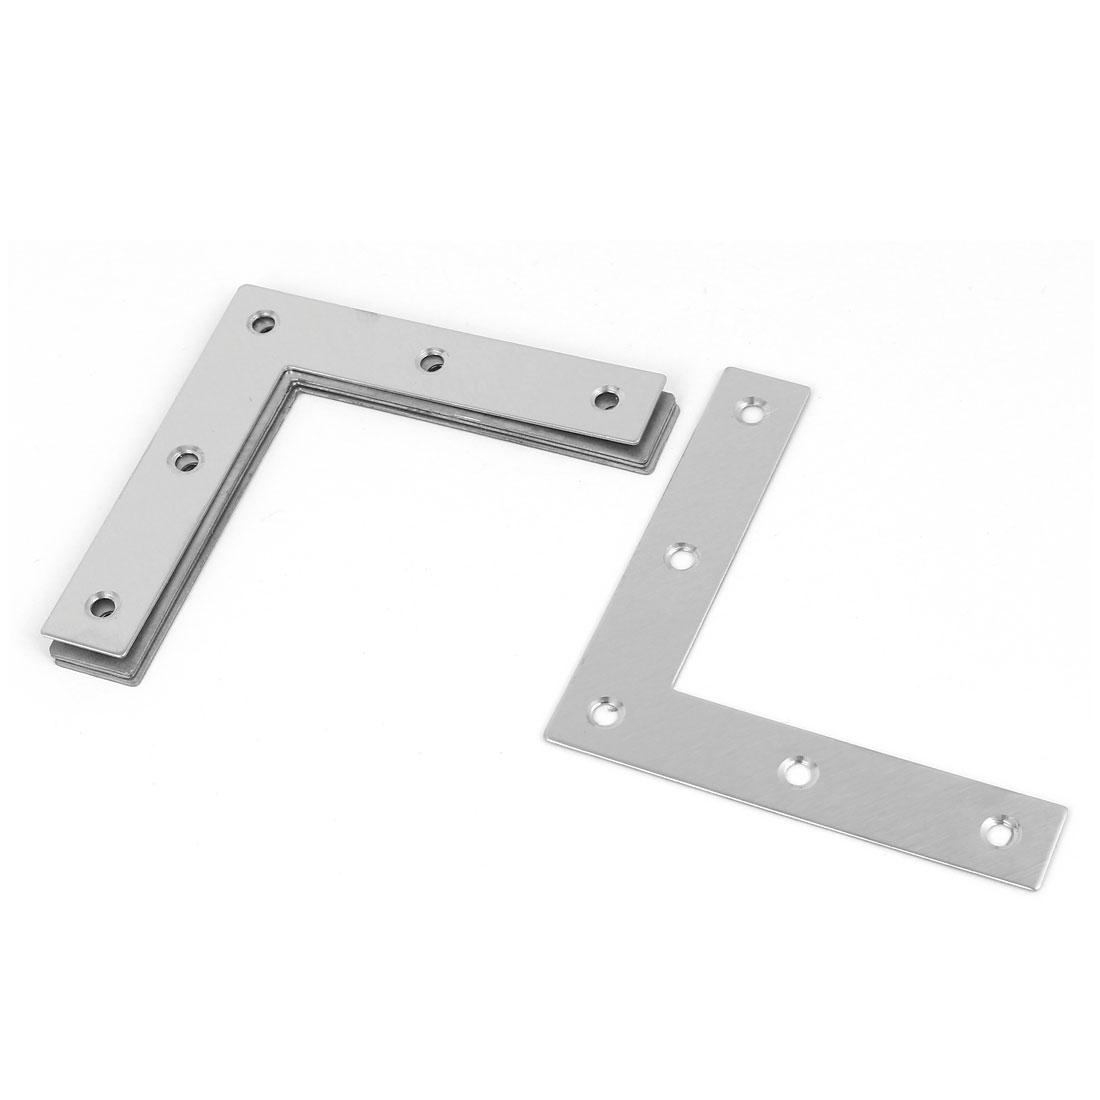 5pcs 80mmx80mm L Shaped Stainless Steel Angle Bracket Corner Brace Silver Tone